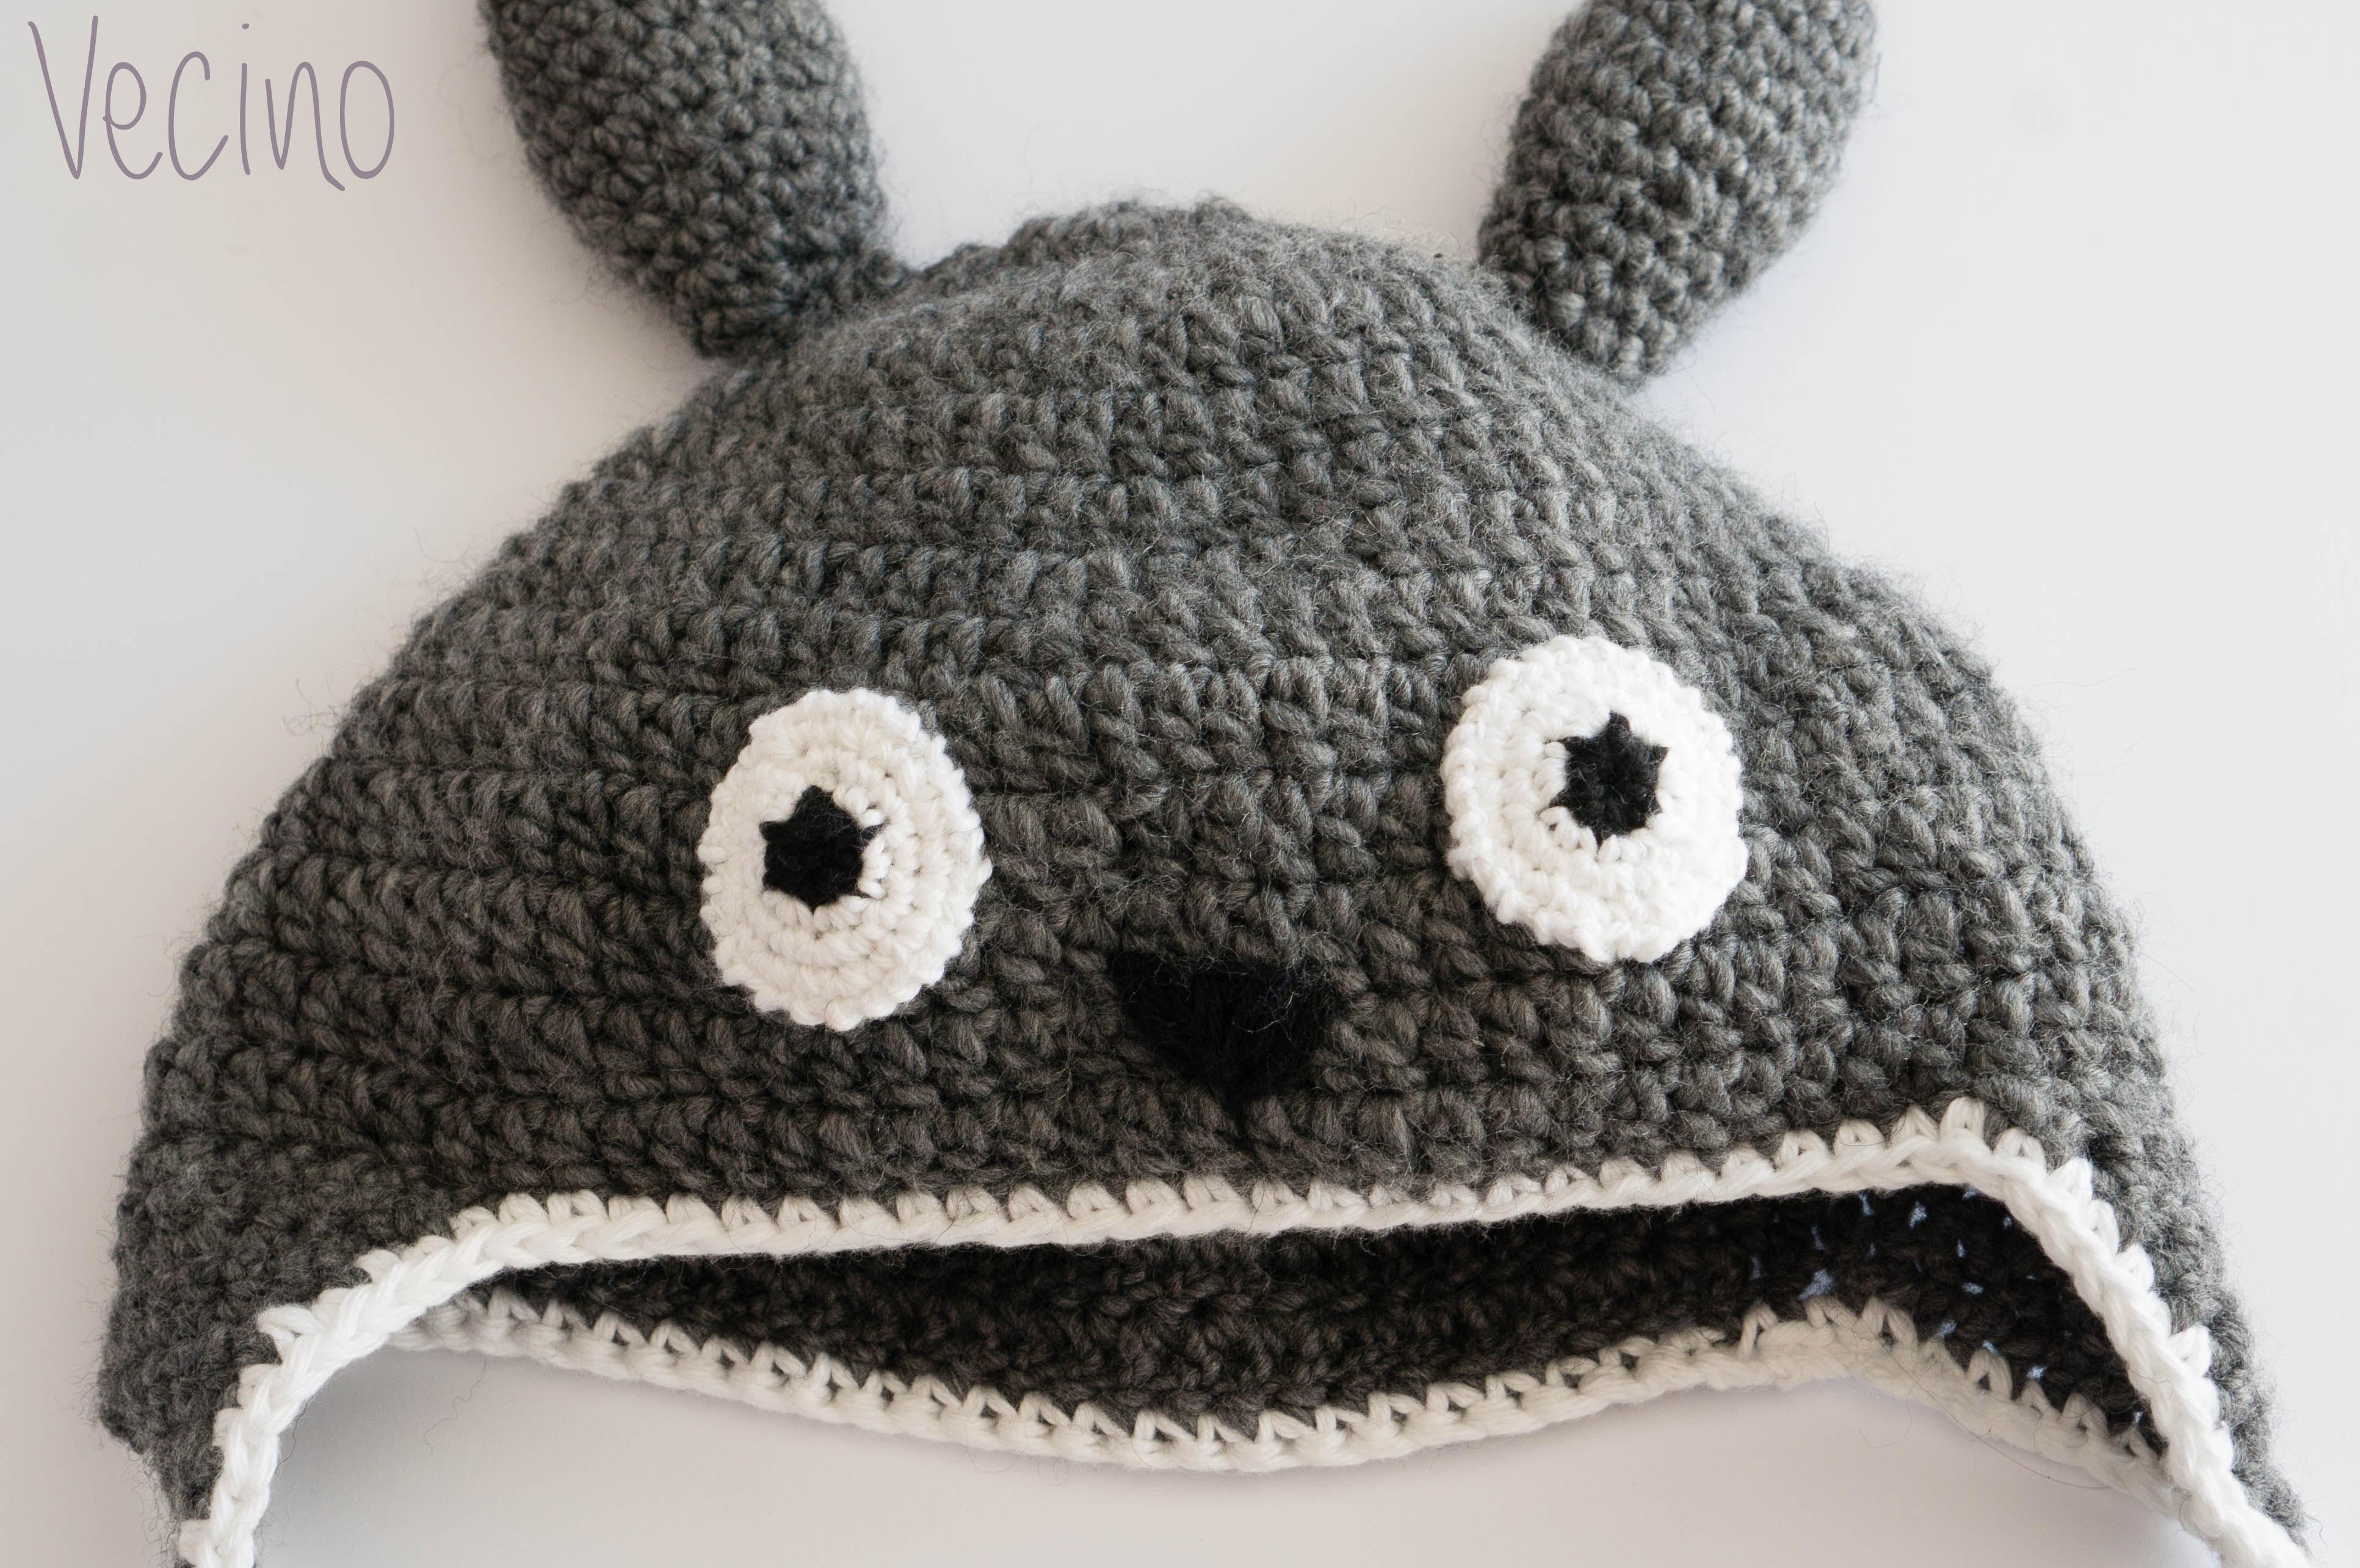 Totoro crochet hat · El taller de Aracne · Online Store Powered by ... 2bb0cf02ef4